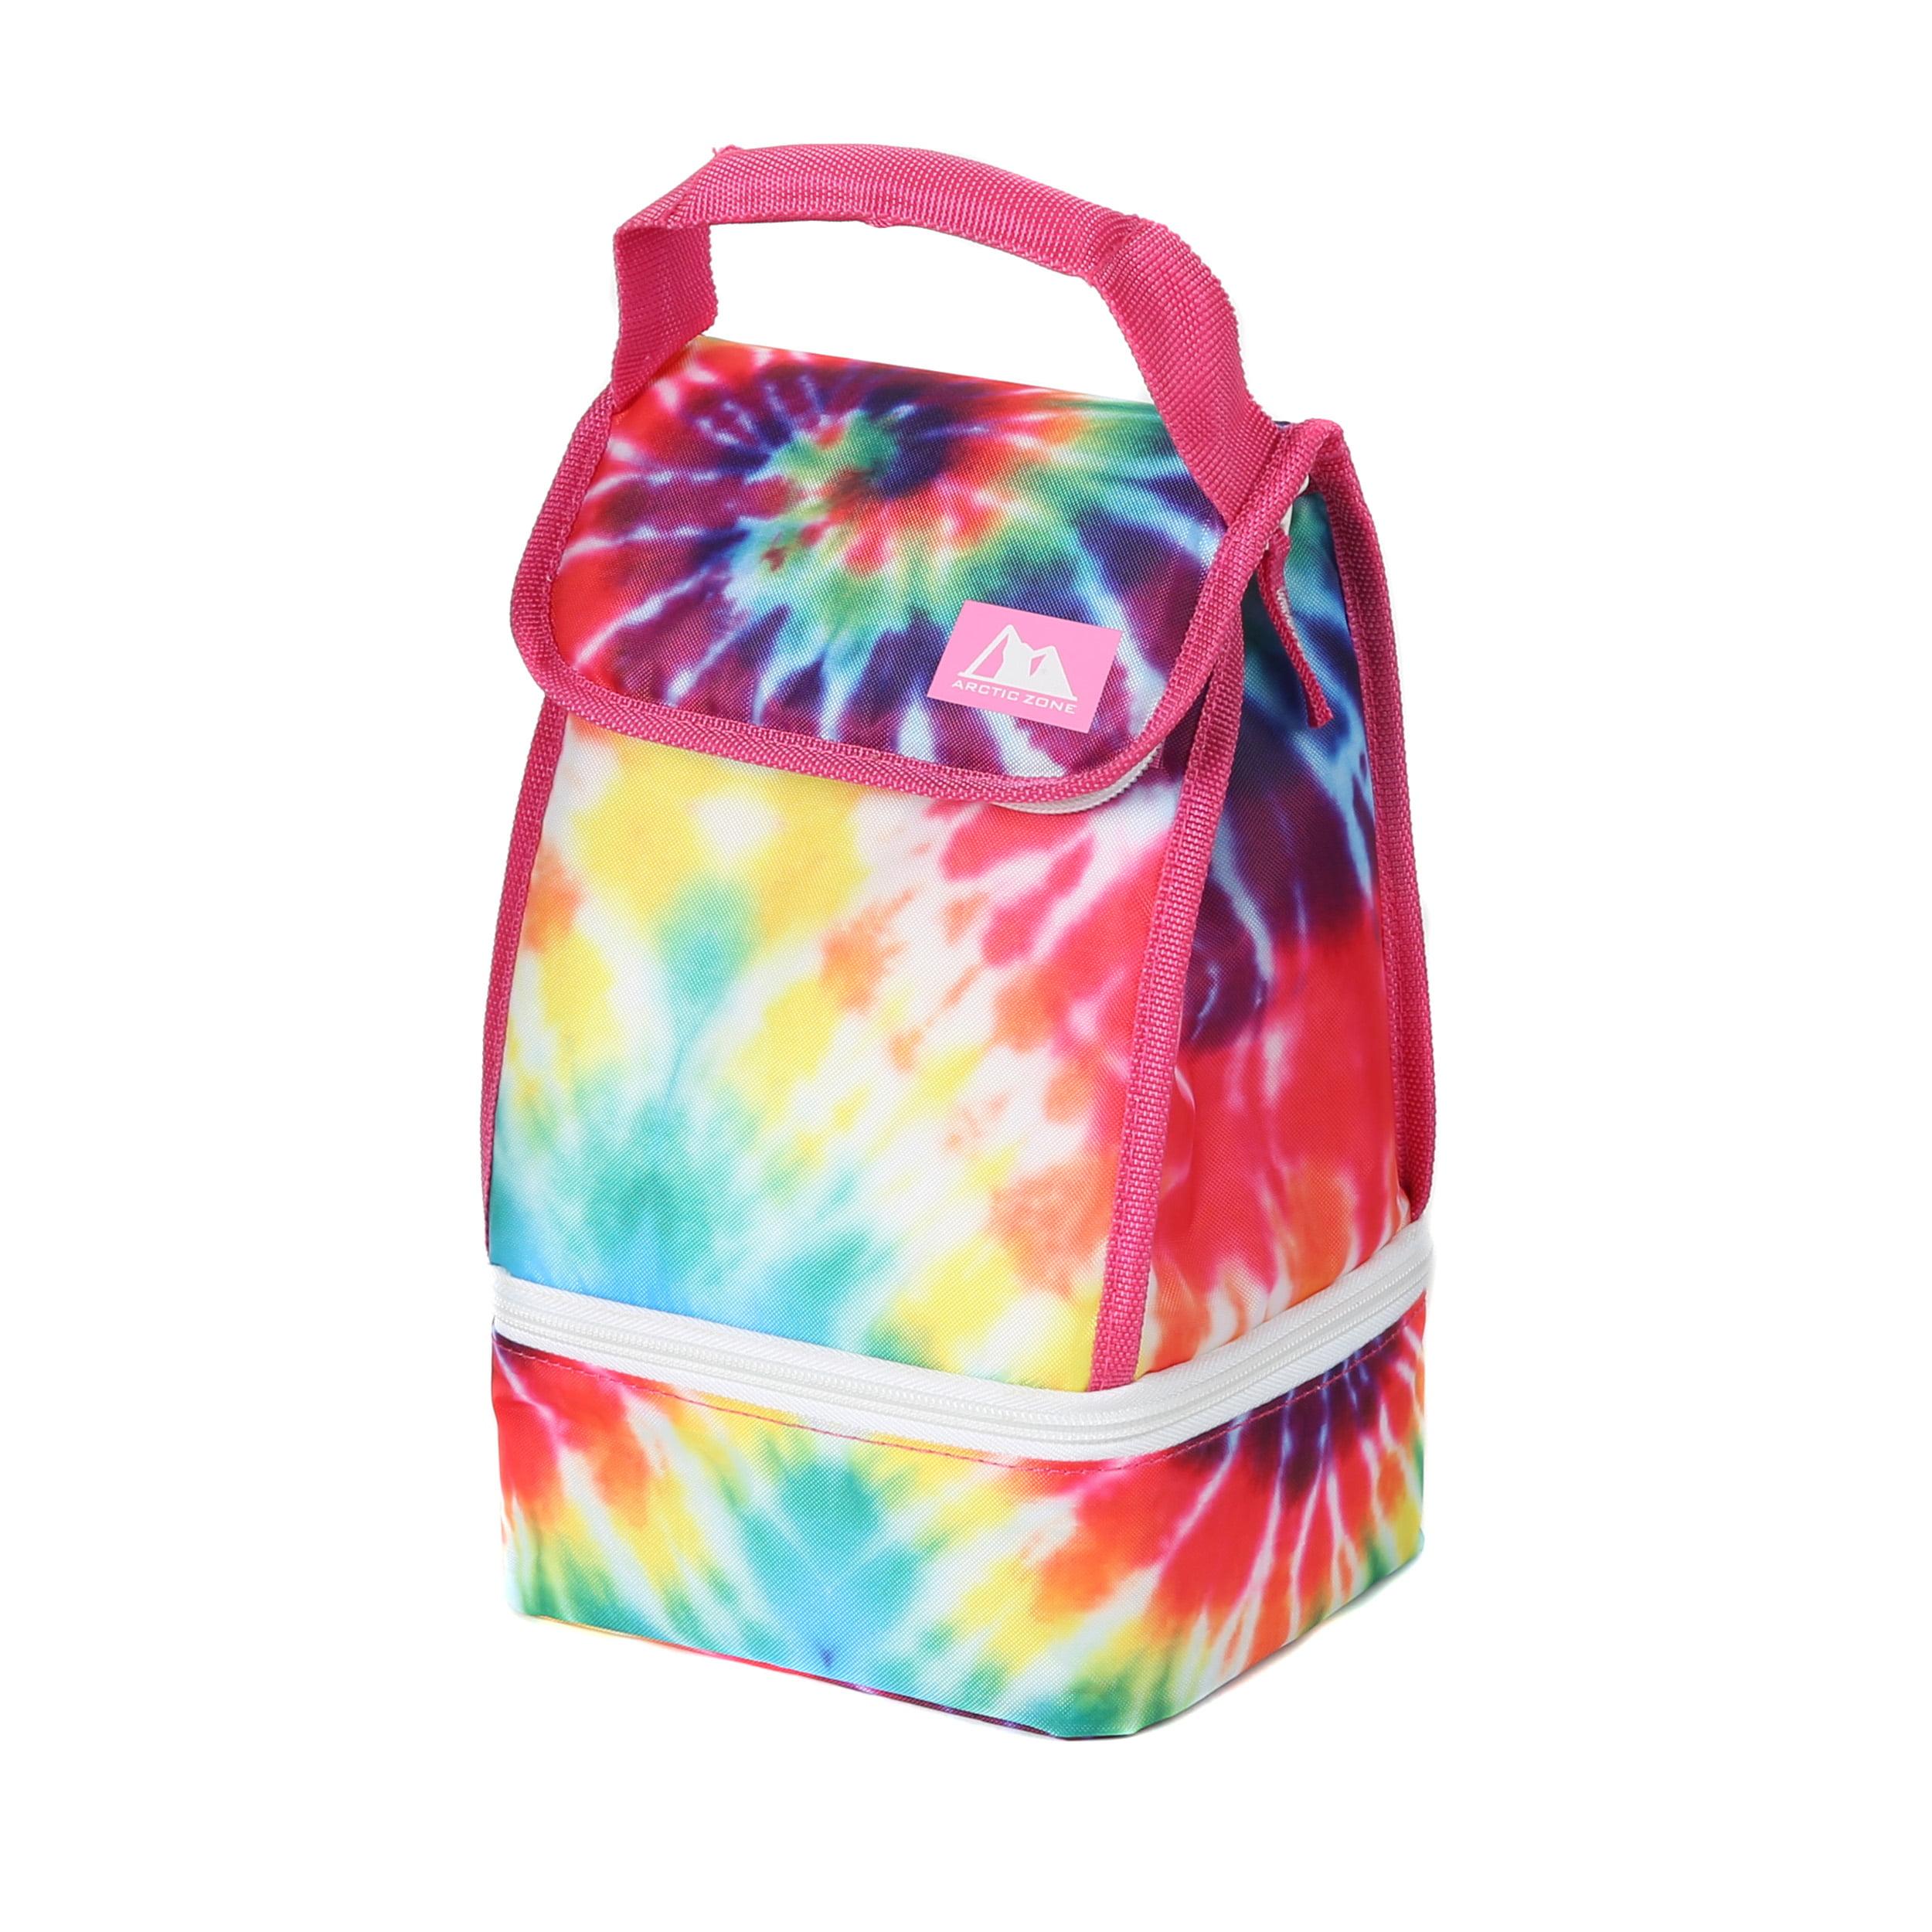 Arctic Zone Lunch Bag Plus, Tie Dye